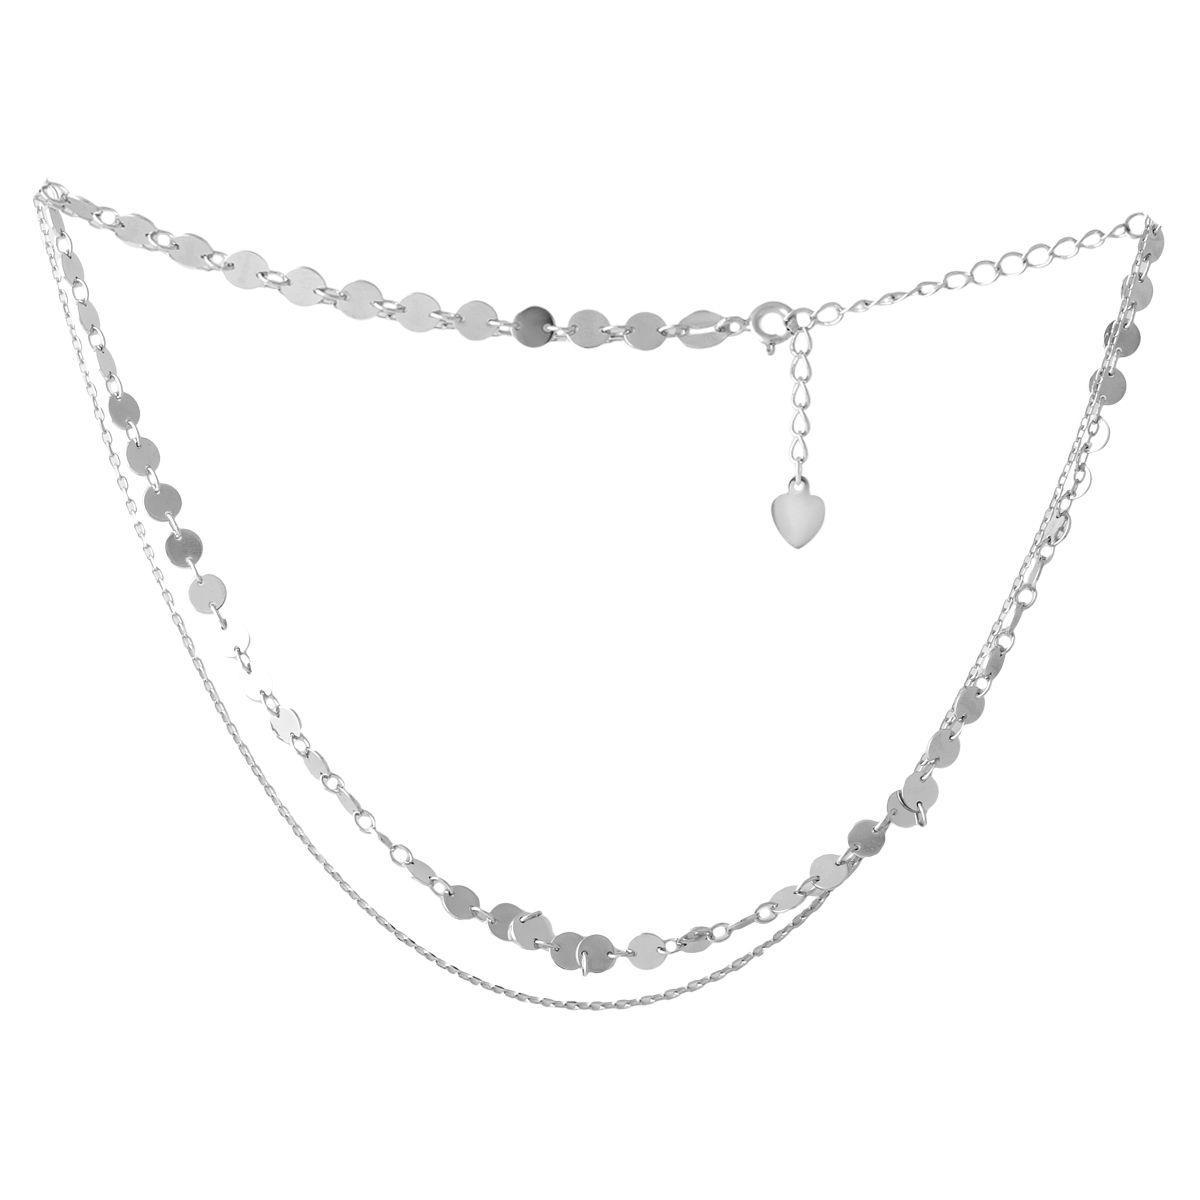 Серебряное колье pSilverAlex без камней (2052951) 350400 размер